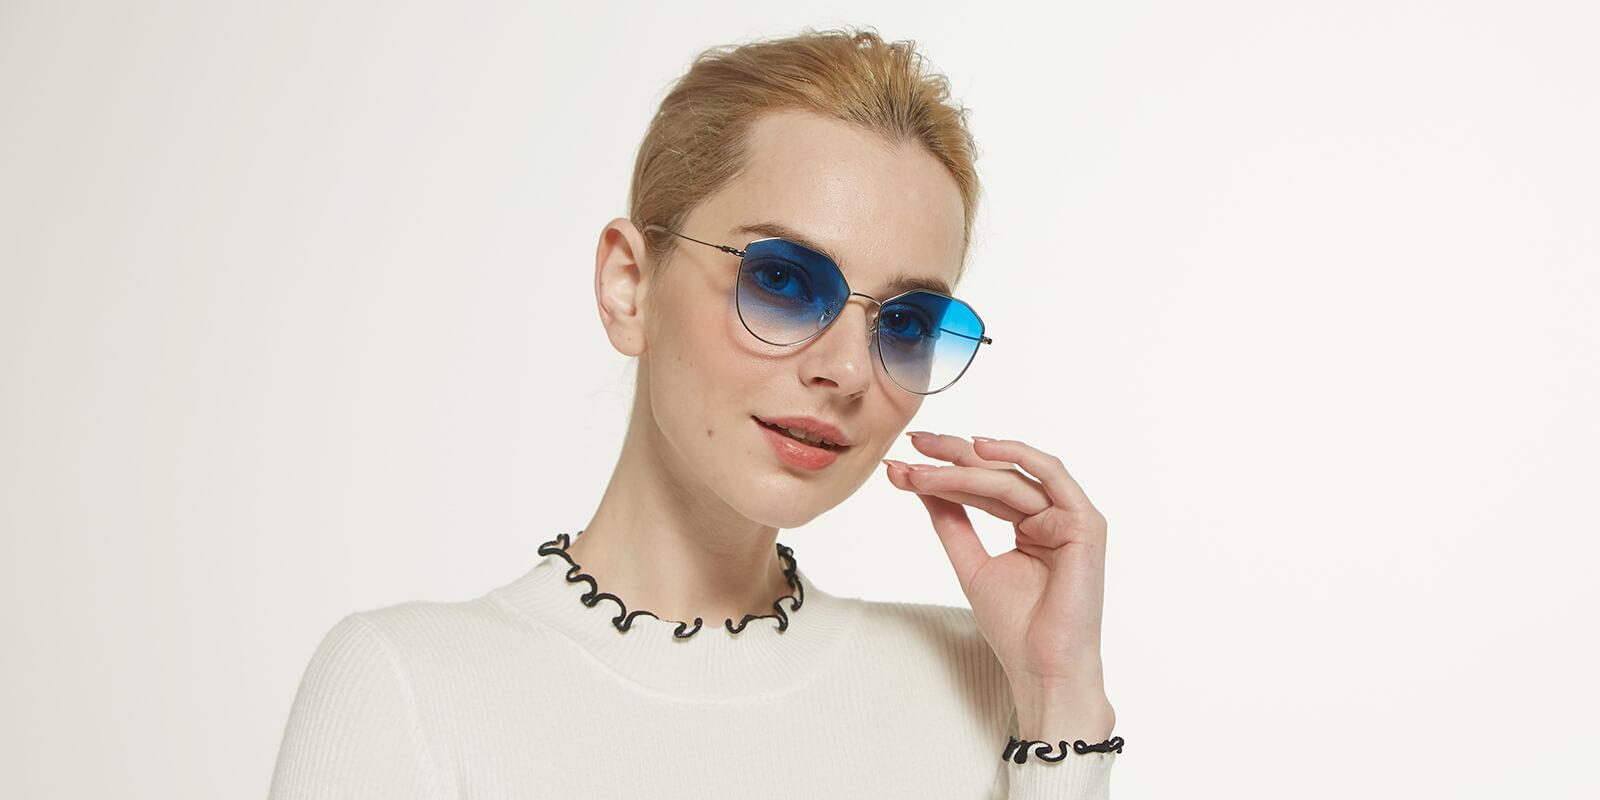 Surberly-Silver-Metal-Eyeglasses-detail3